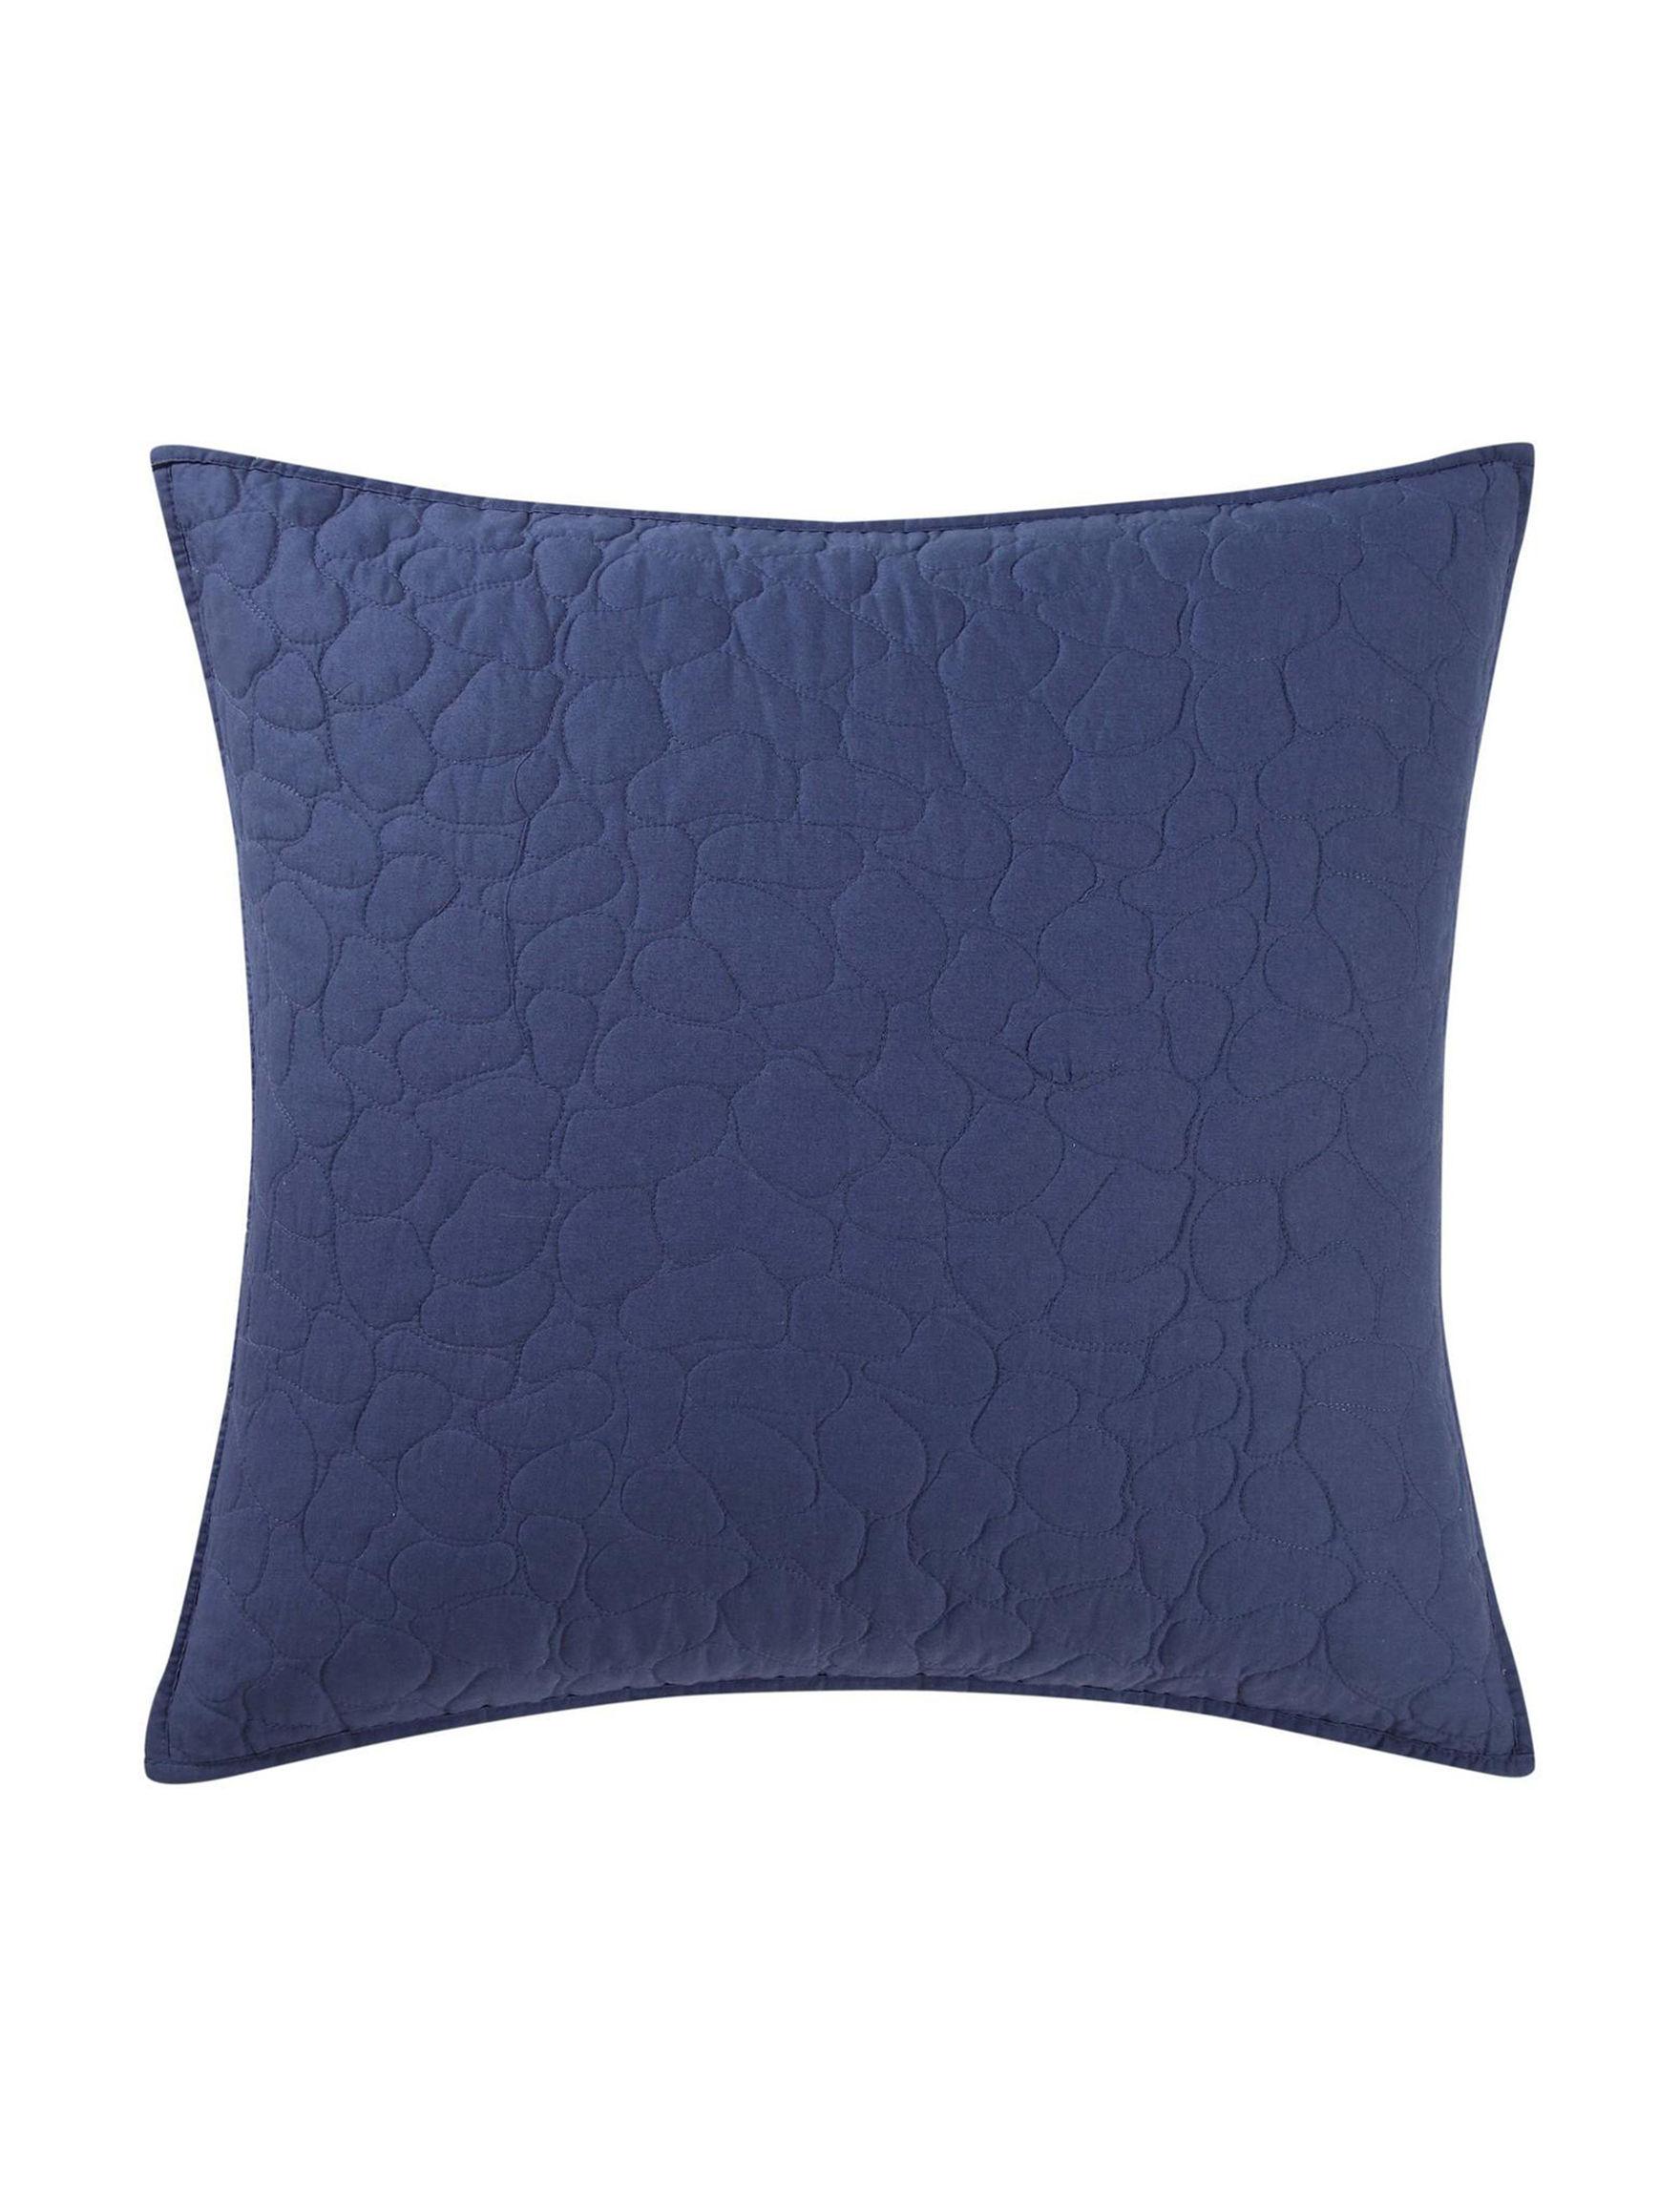 Tracy Porter Purple Pillow Shams